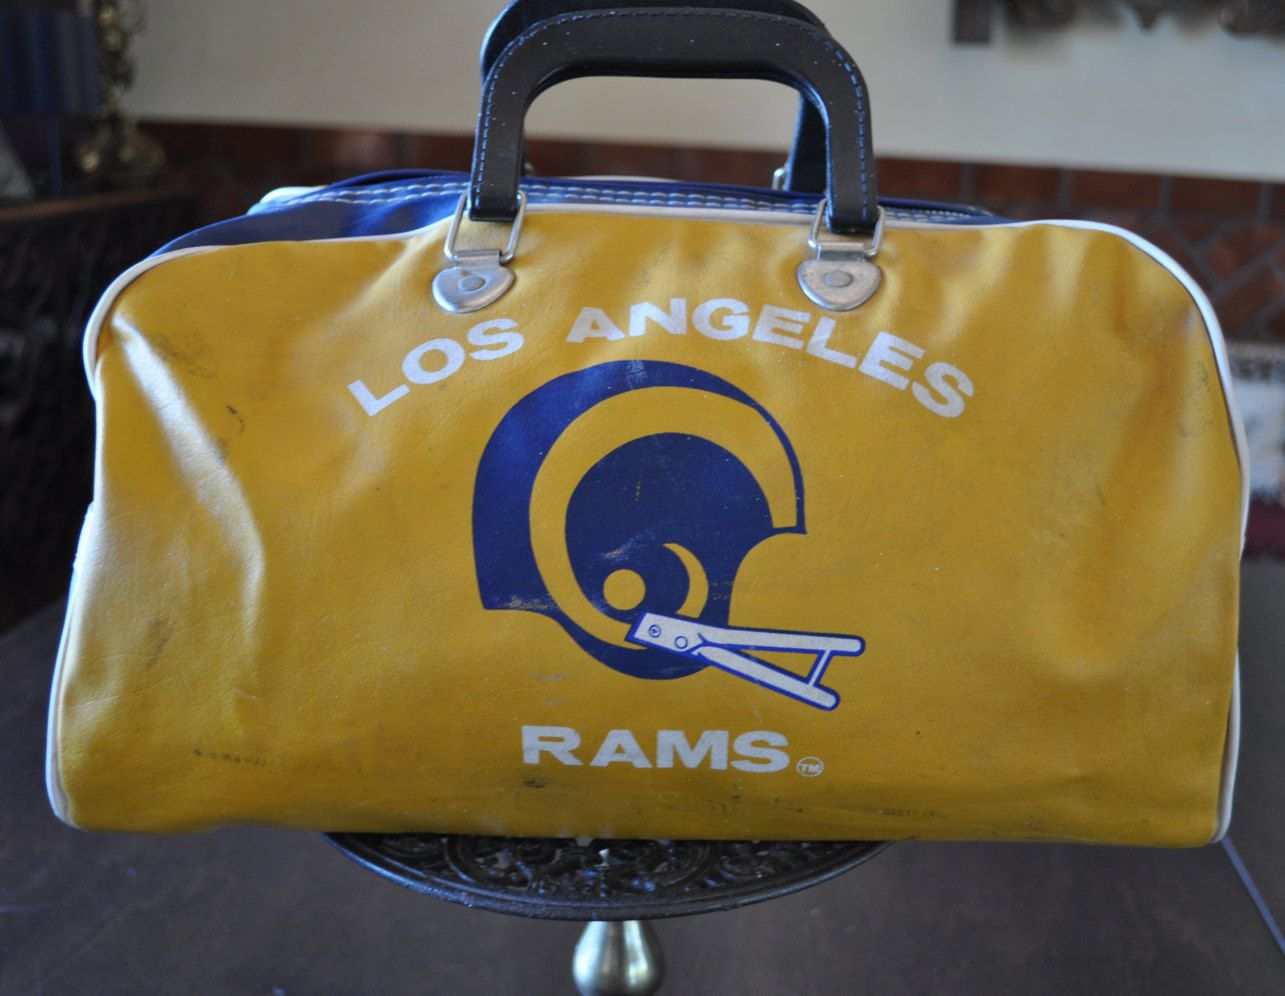 Los Angeles Rams Vintage Gym Bag Team Vinyl Zipper Close Football Travel Tote Great Retro Piece